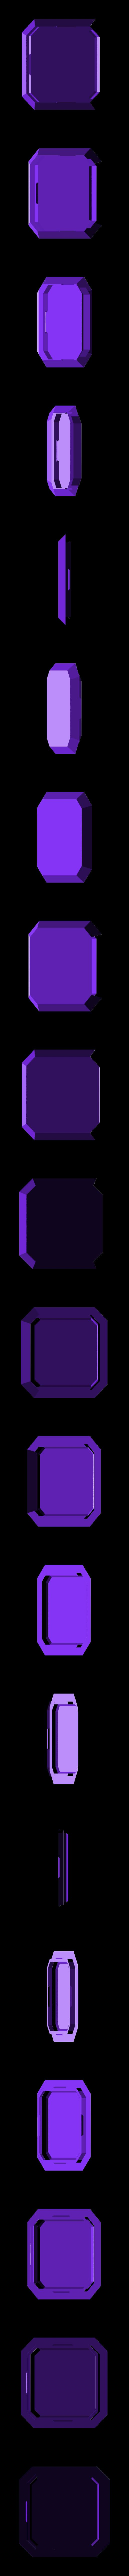 ttc-side.stl Download free STL file Time Tracking Cube • 3D print design, Adafruit